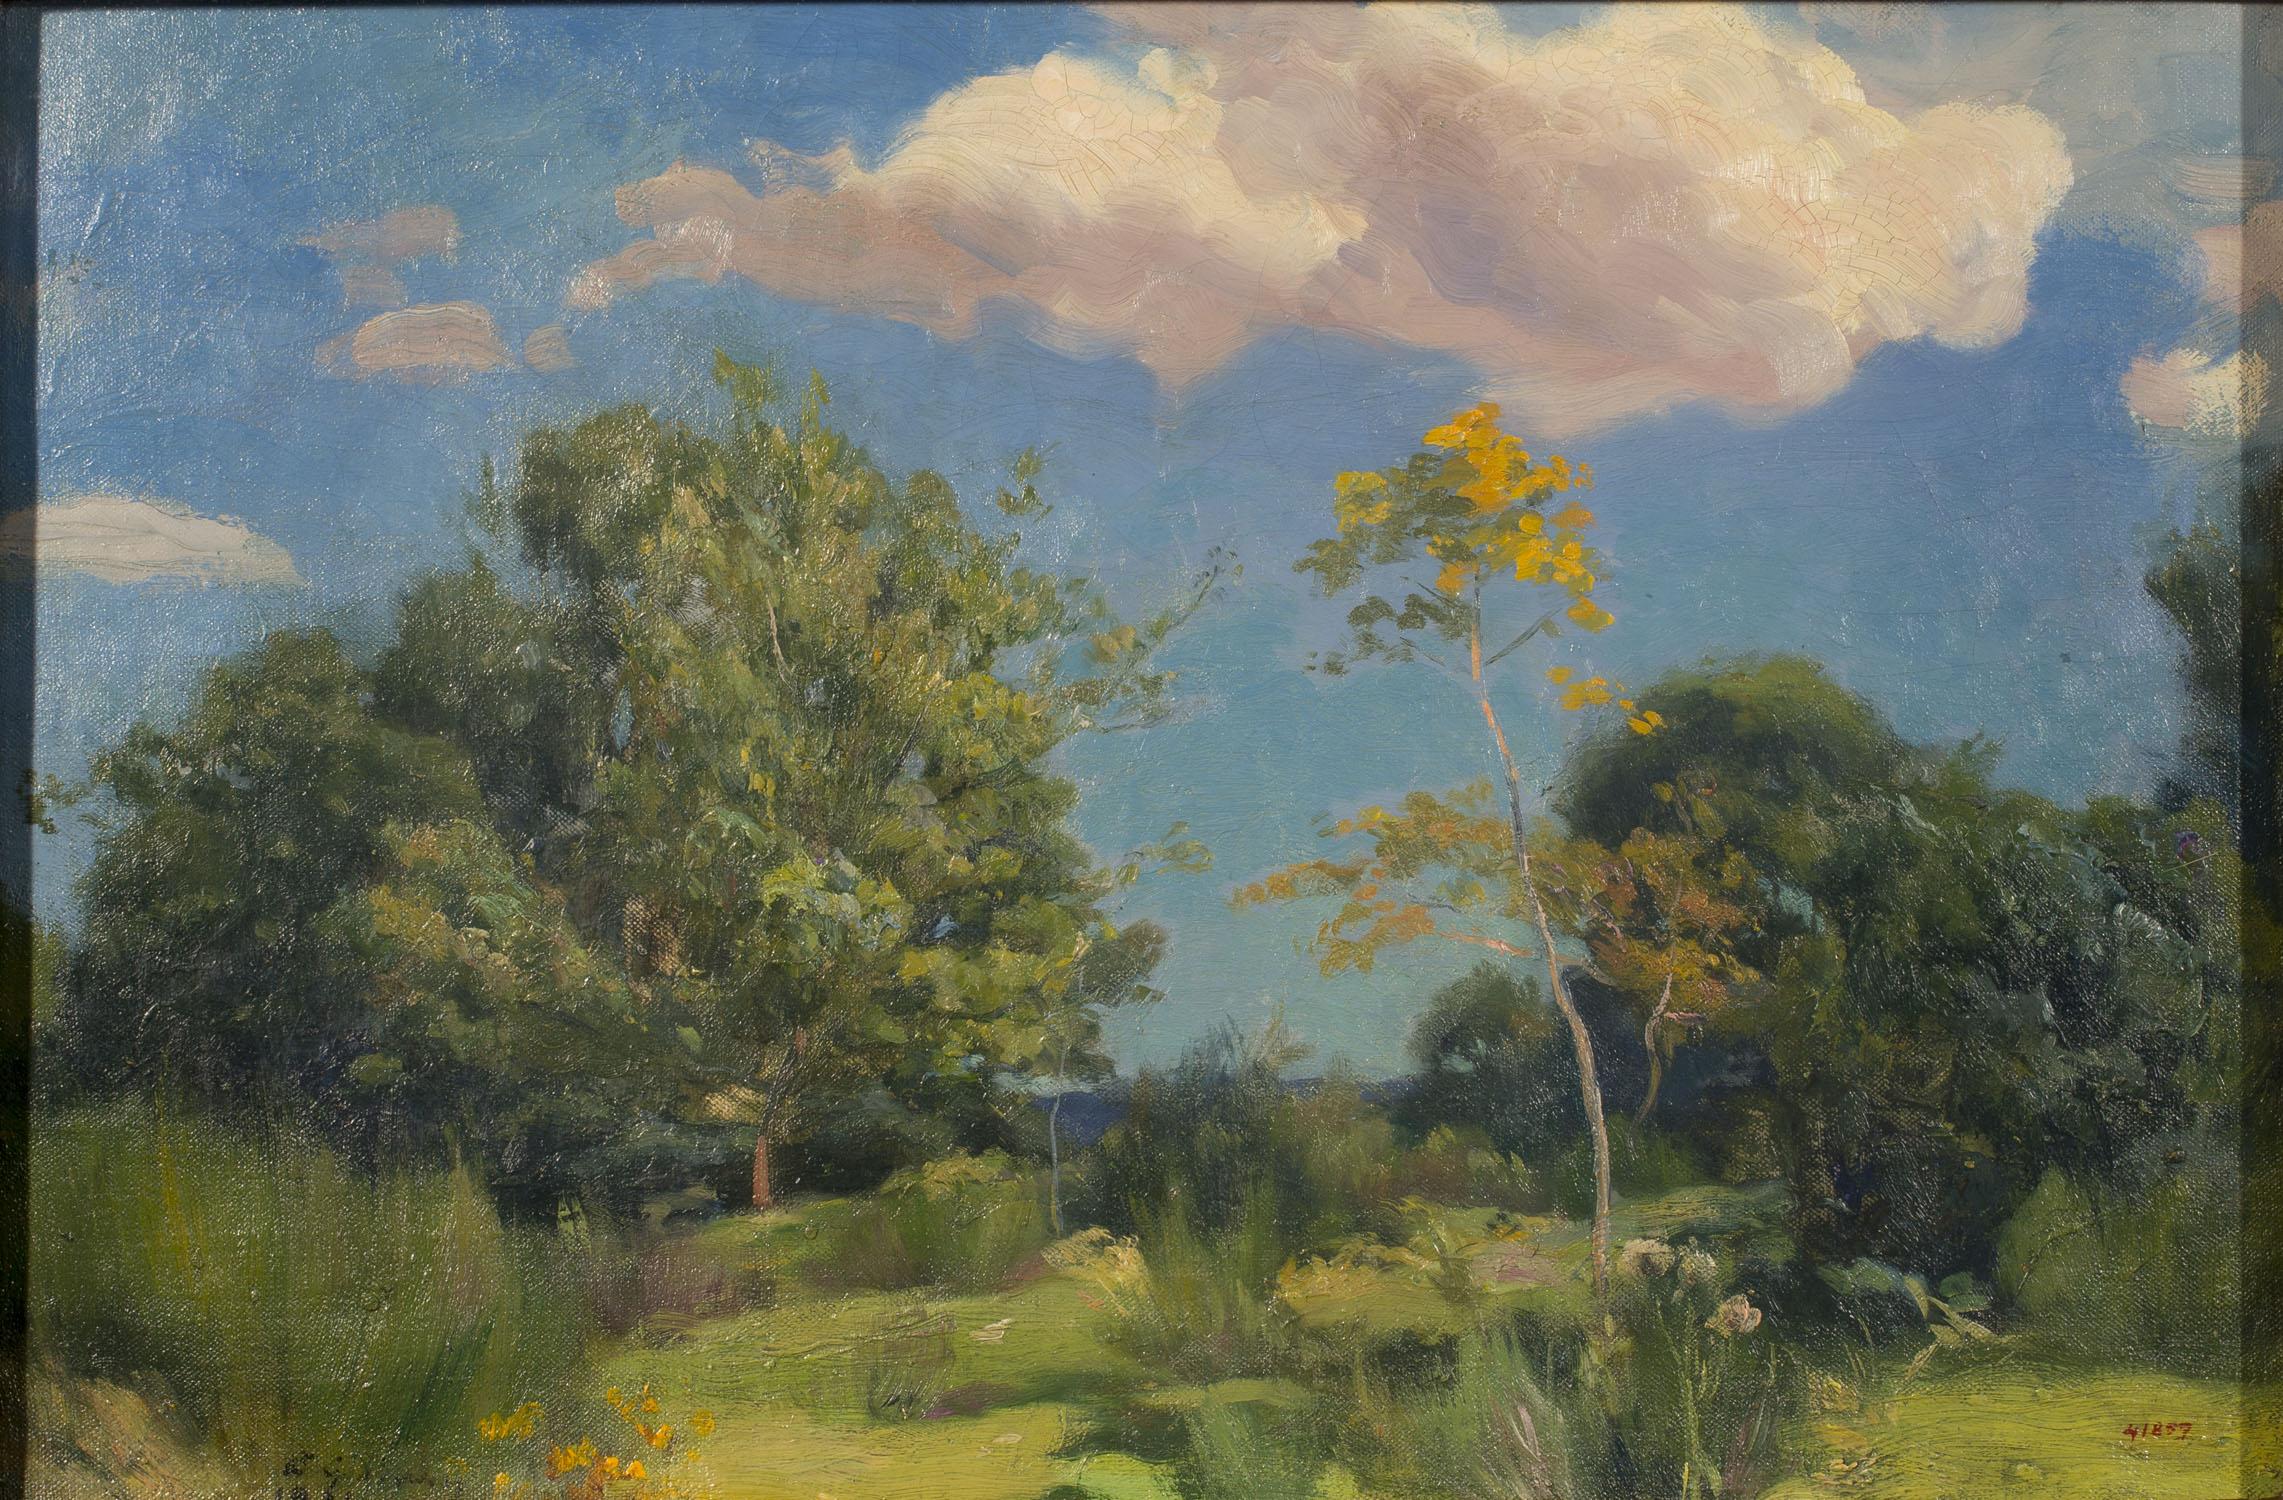 Enric Galwey - Paisatge amb arbres - 1922